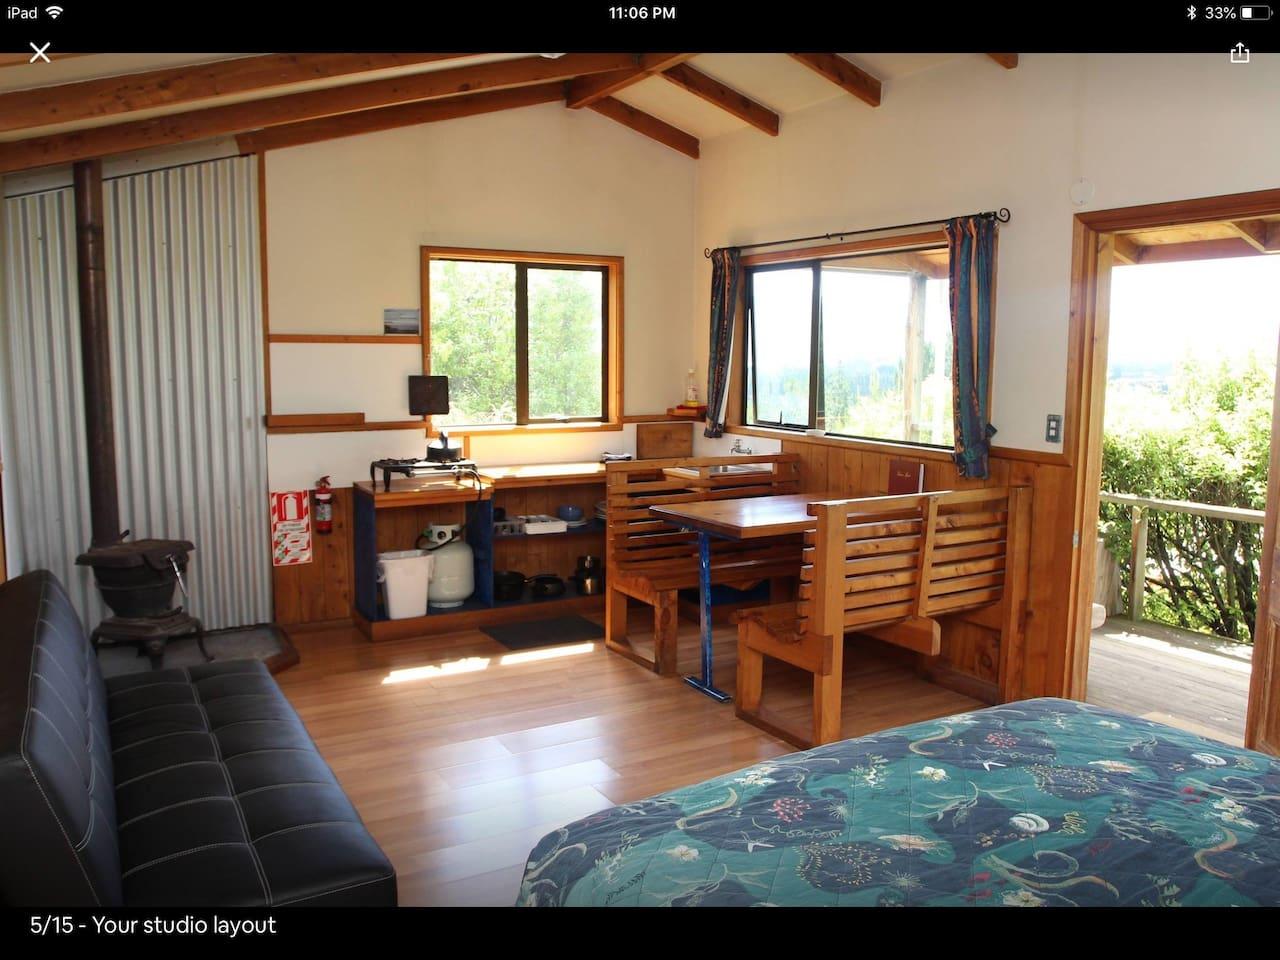 Inside Freestone Cabin on the hill